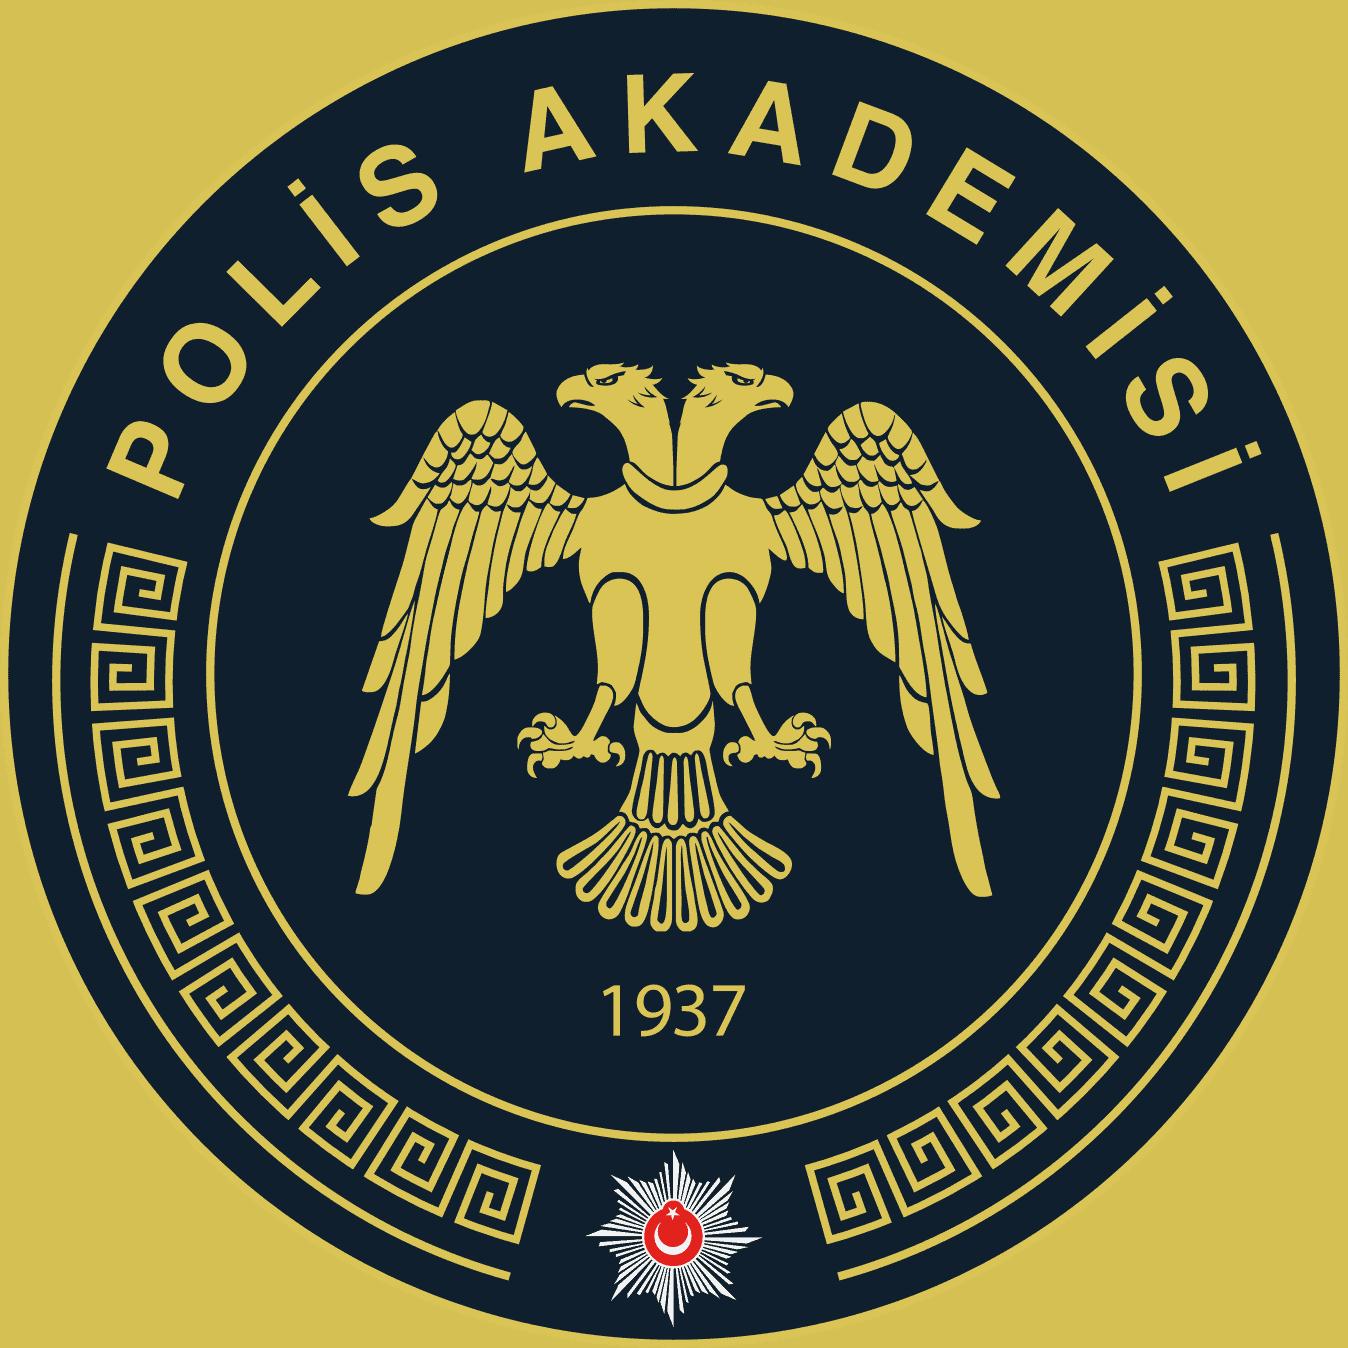 Polis Akademisi Logo png